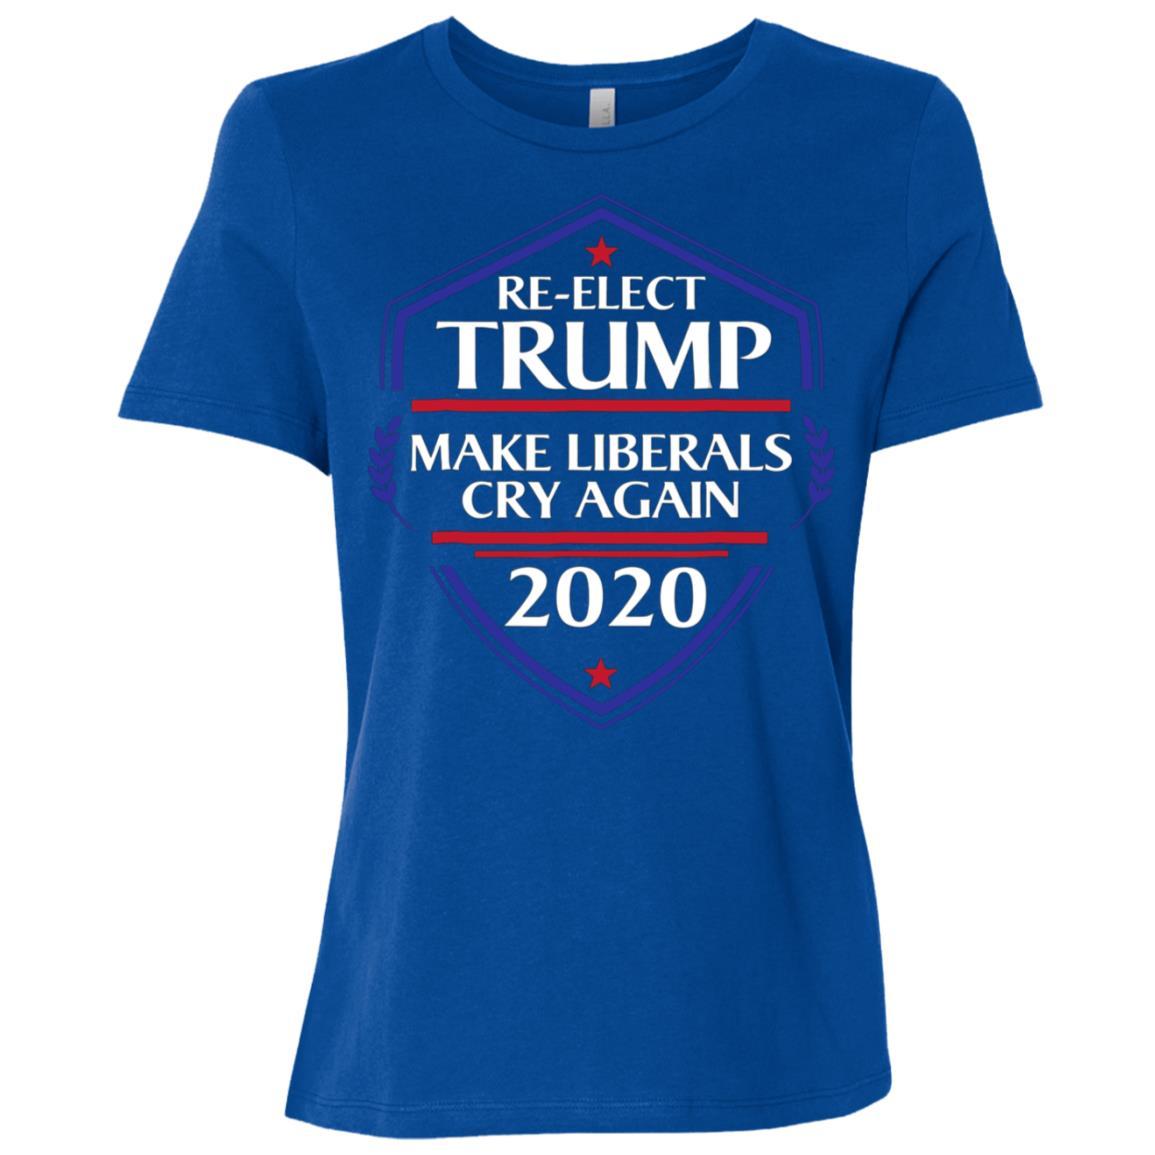 Re-elect Trump Make Liberals Cry Again 2020 Women Short Sleeve T-Shirt